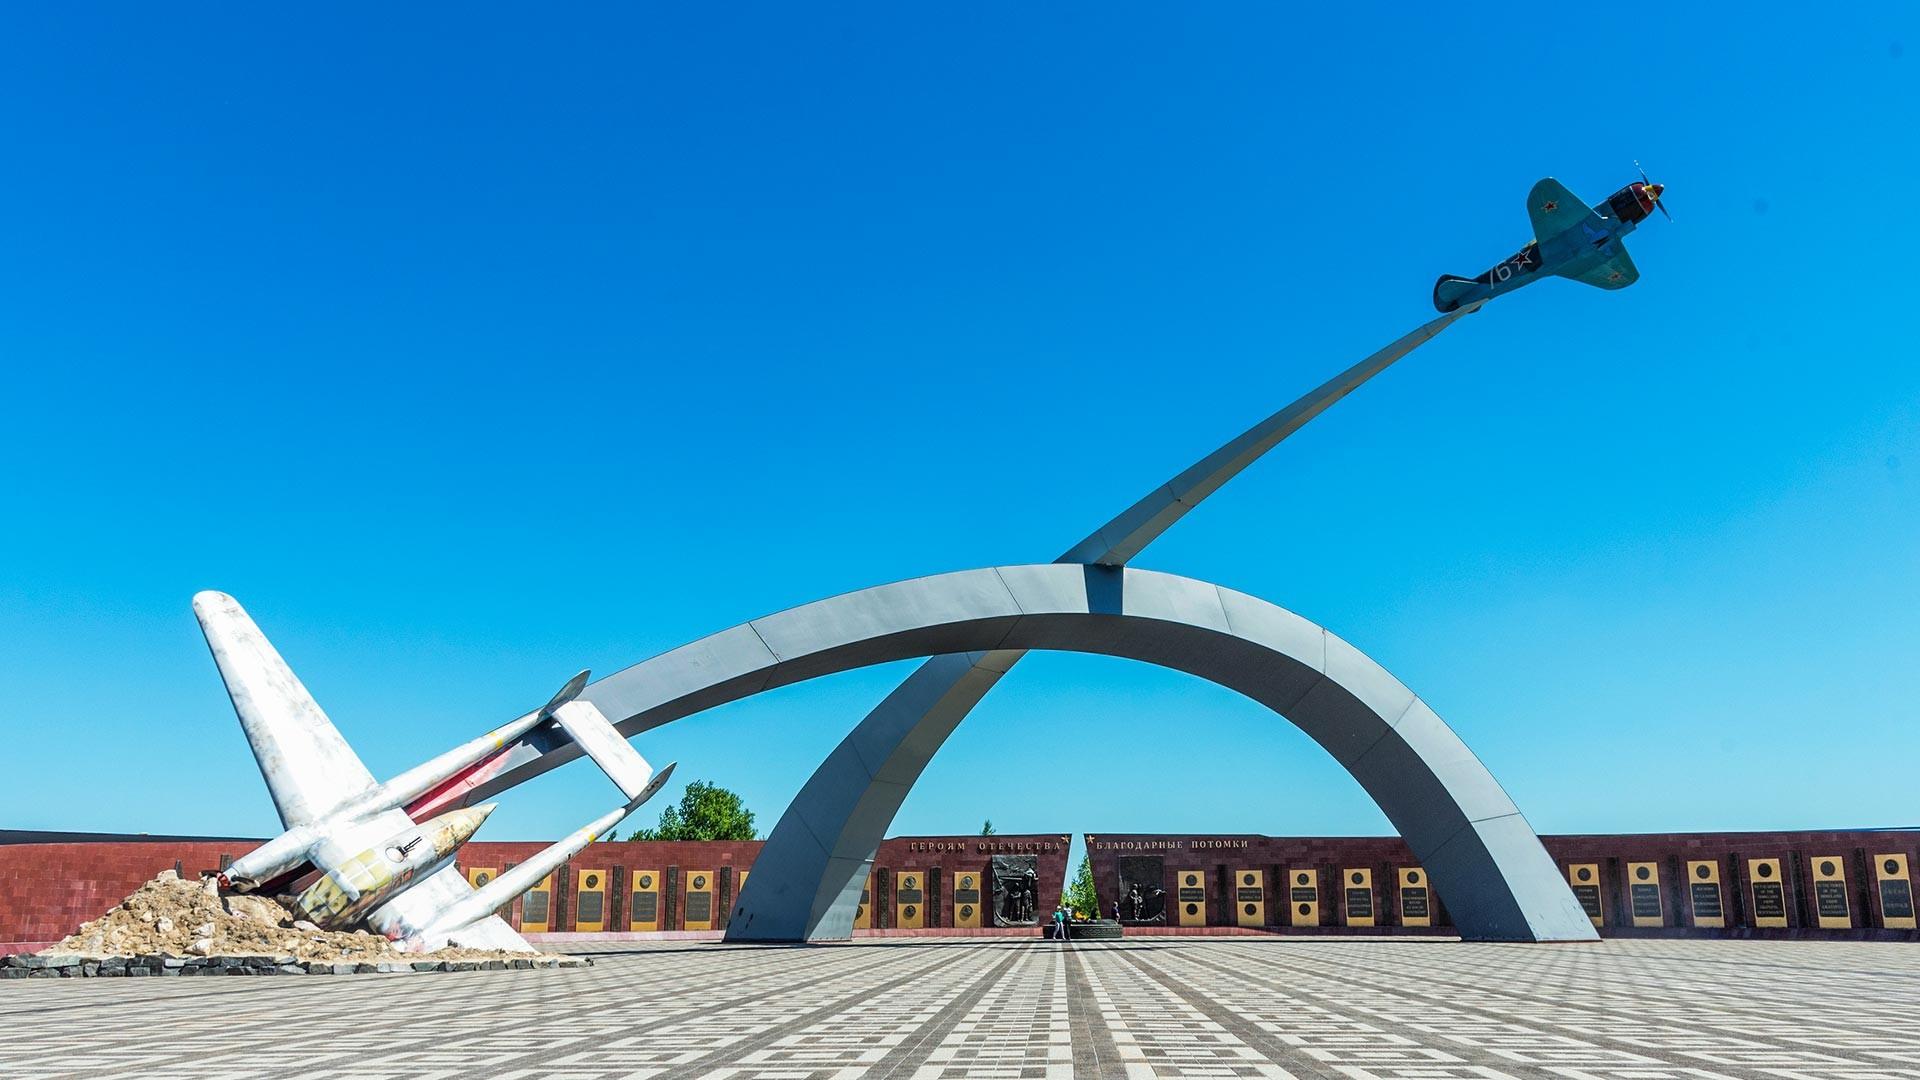 Memorial Complex 'To Defenders of Motherland Sky' in Tula.